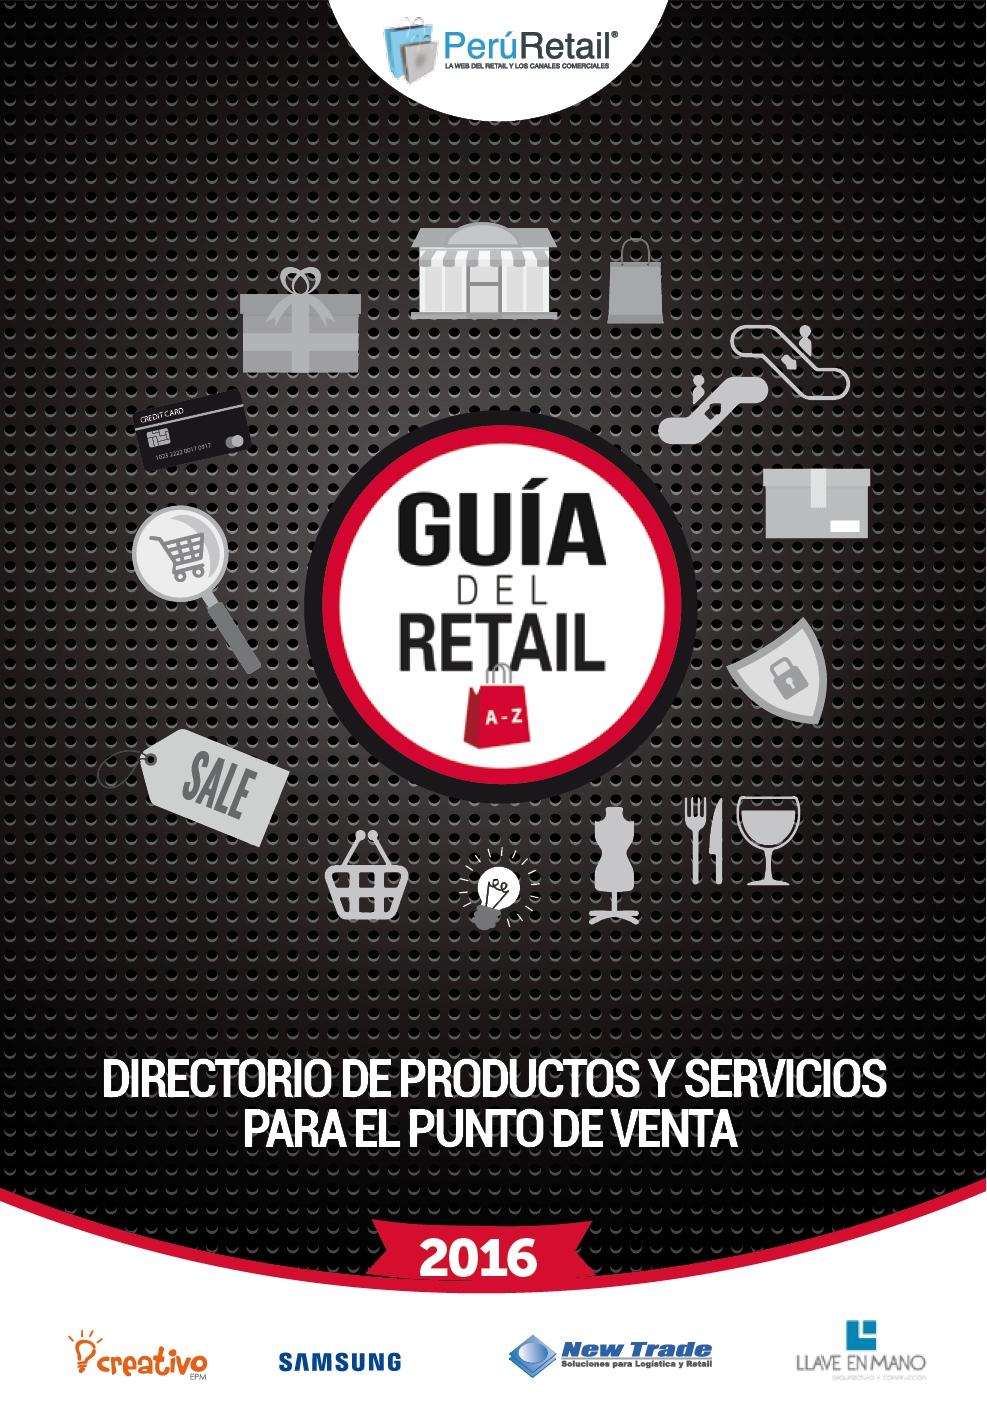 Guia del Retail 2016